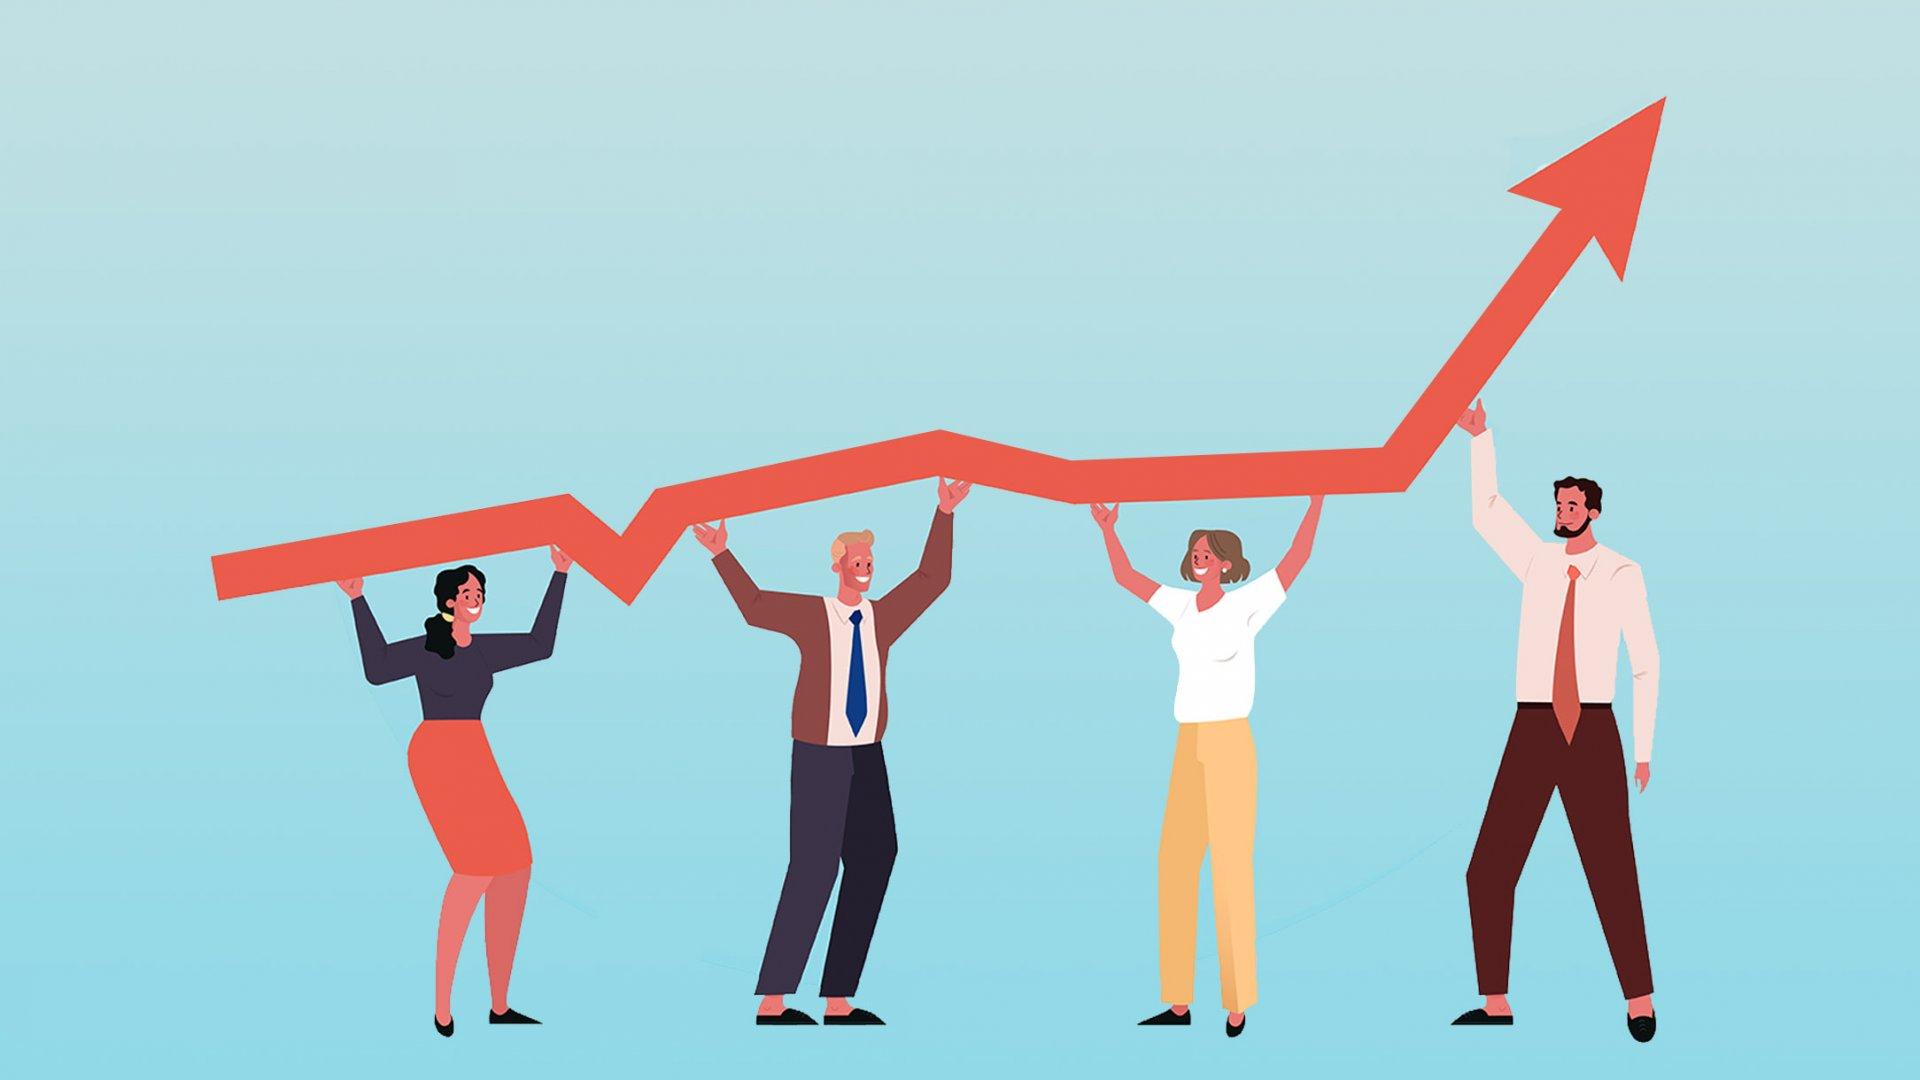 5 Keys to Keep Your Company Growing